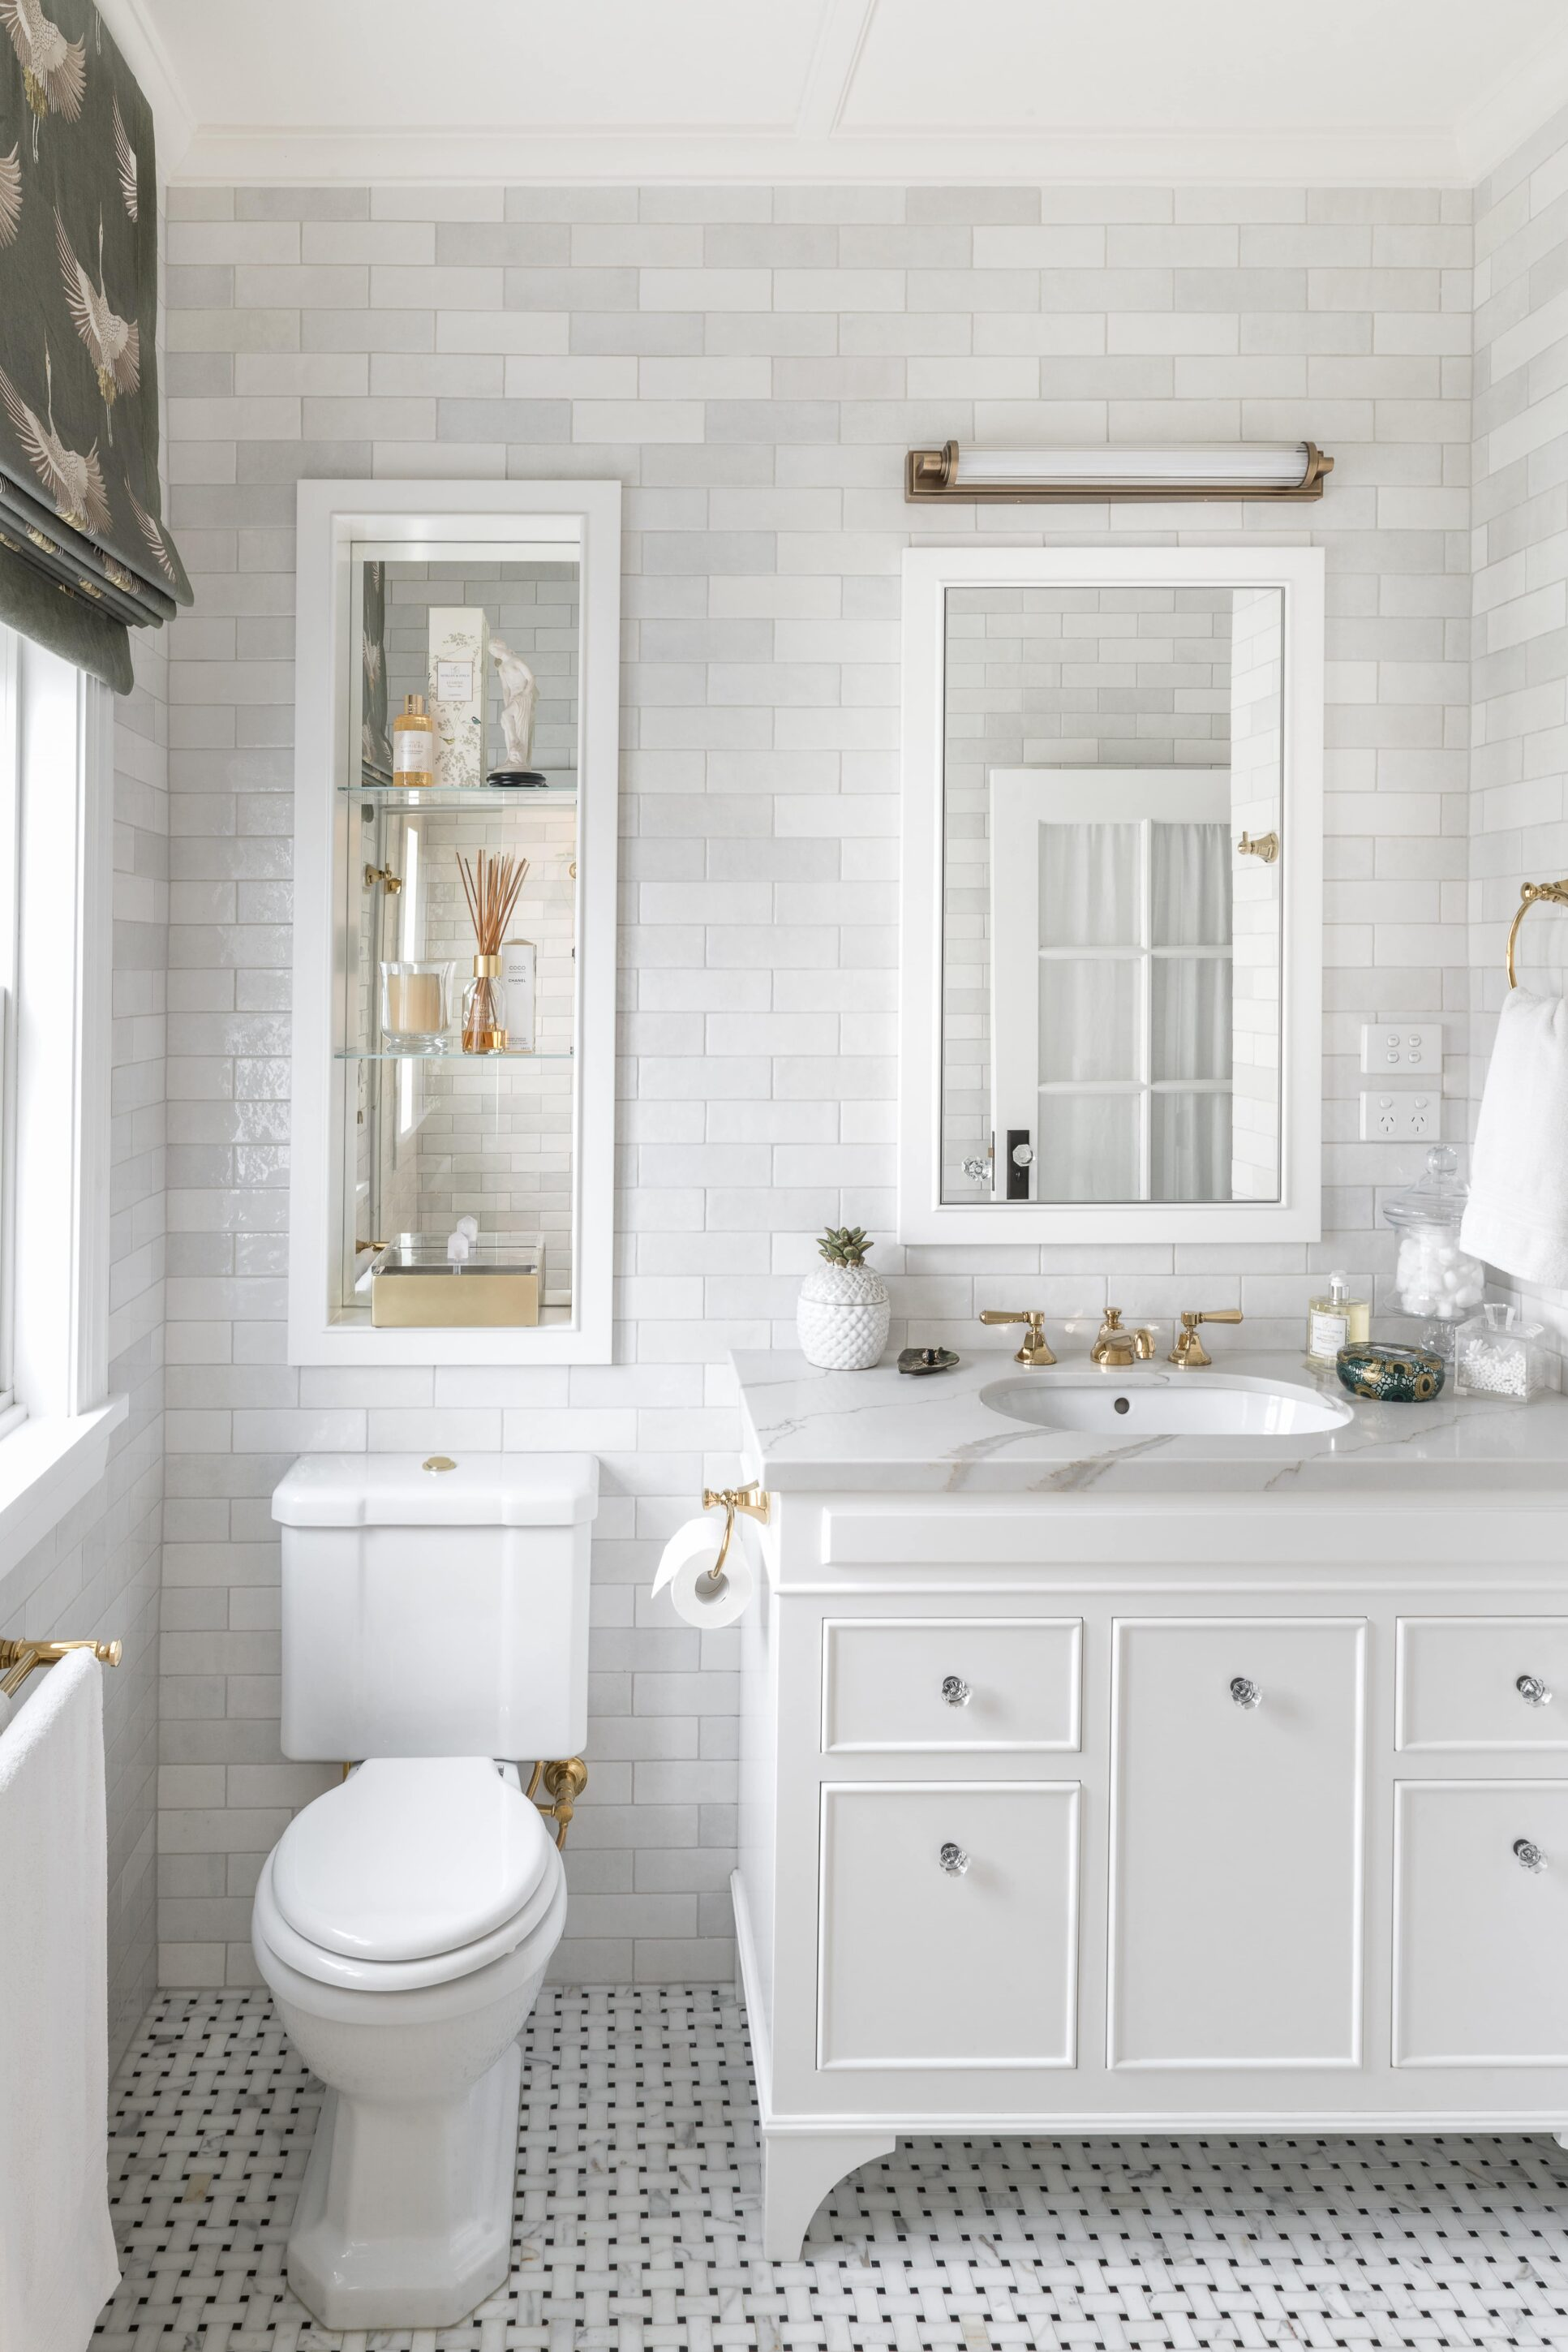 Nadine's Bathroom Reno: After | Journey Home | Blog